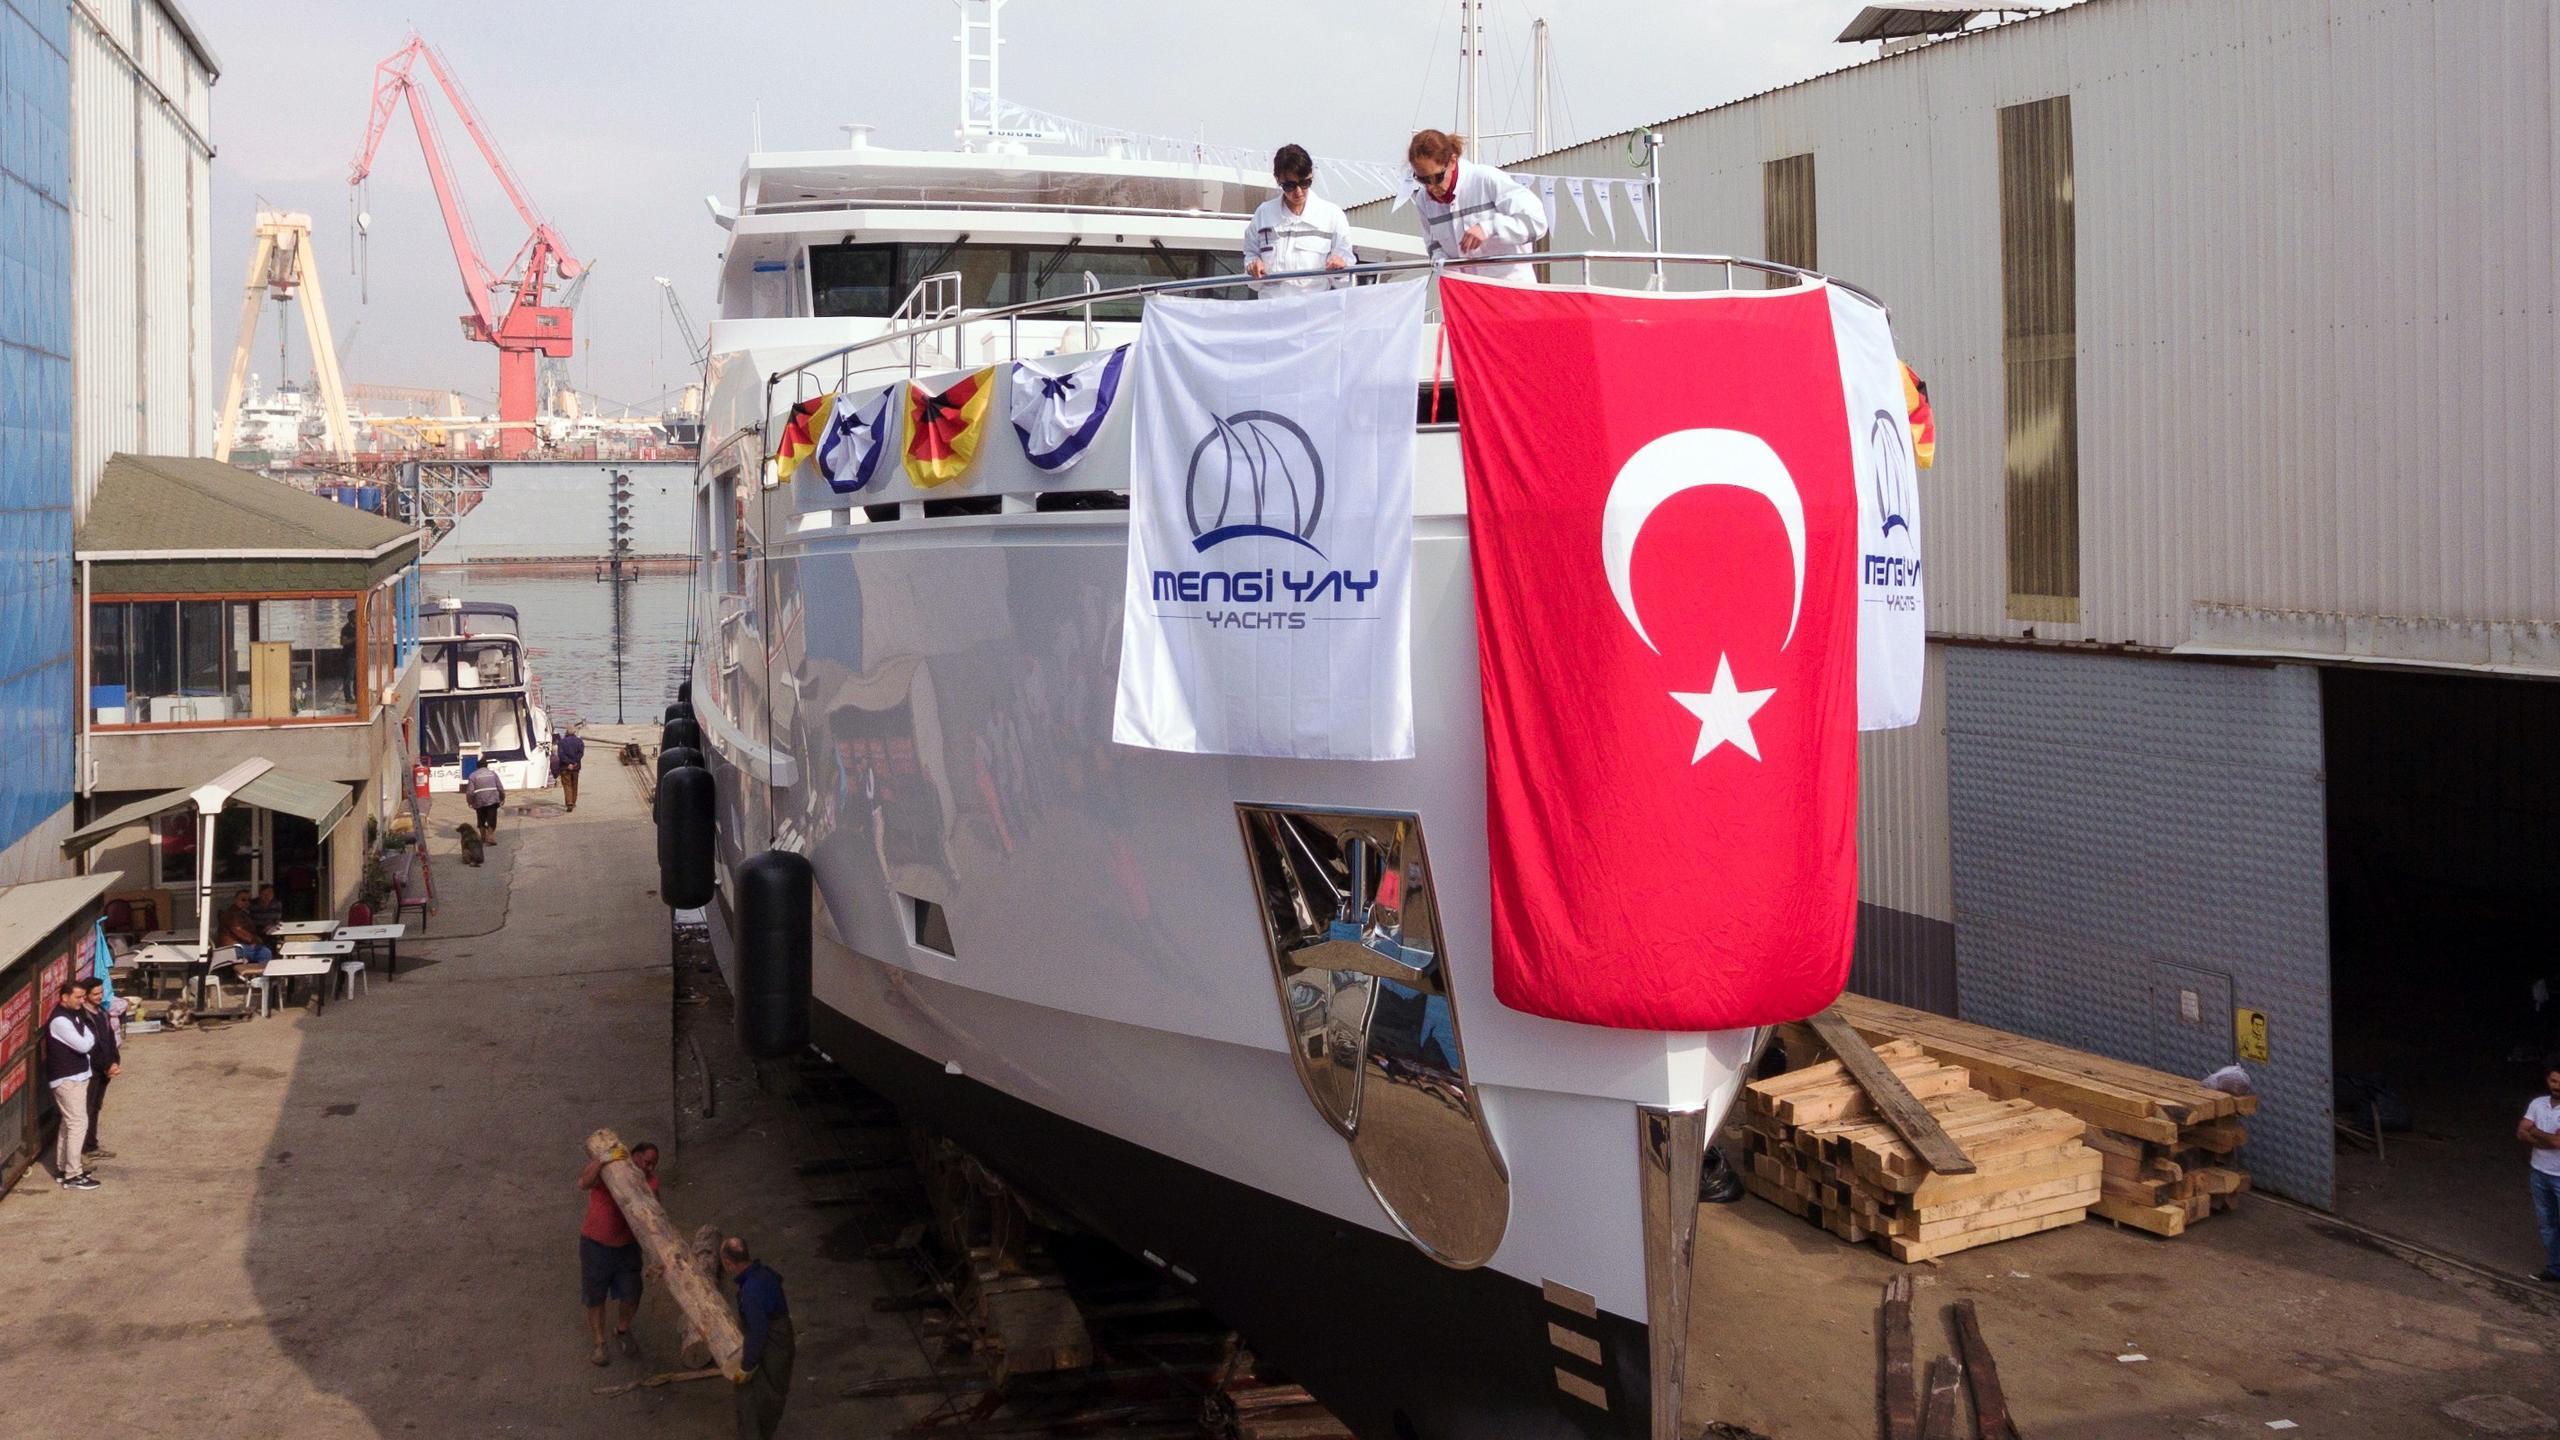 serenitas ii motoryacht mengi yay 32m 2017 launch bow